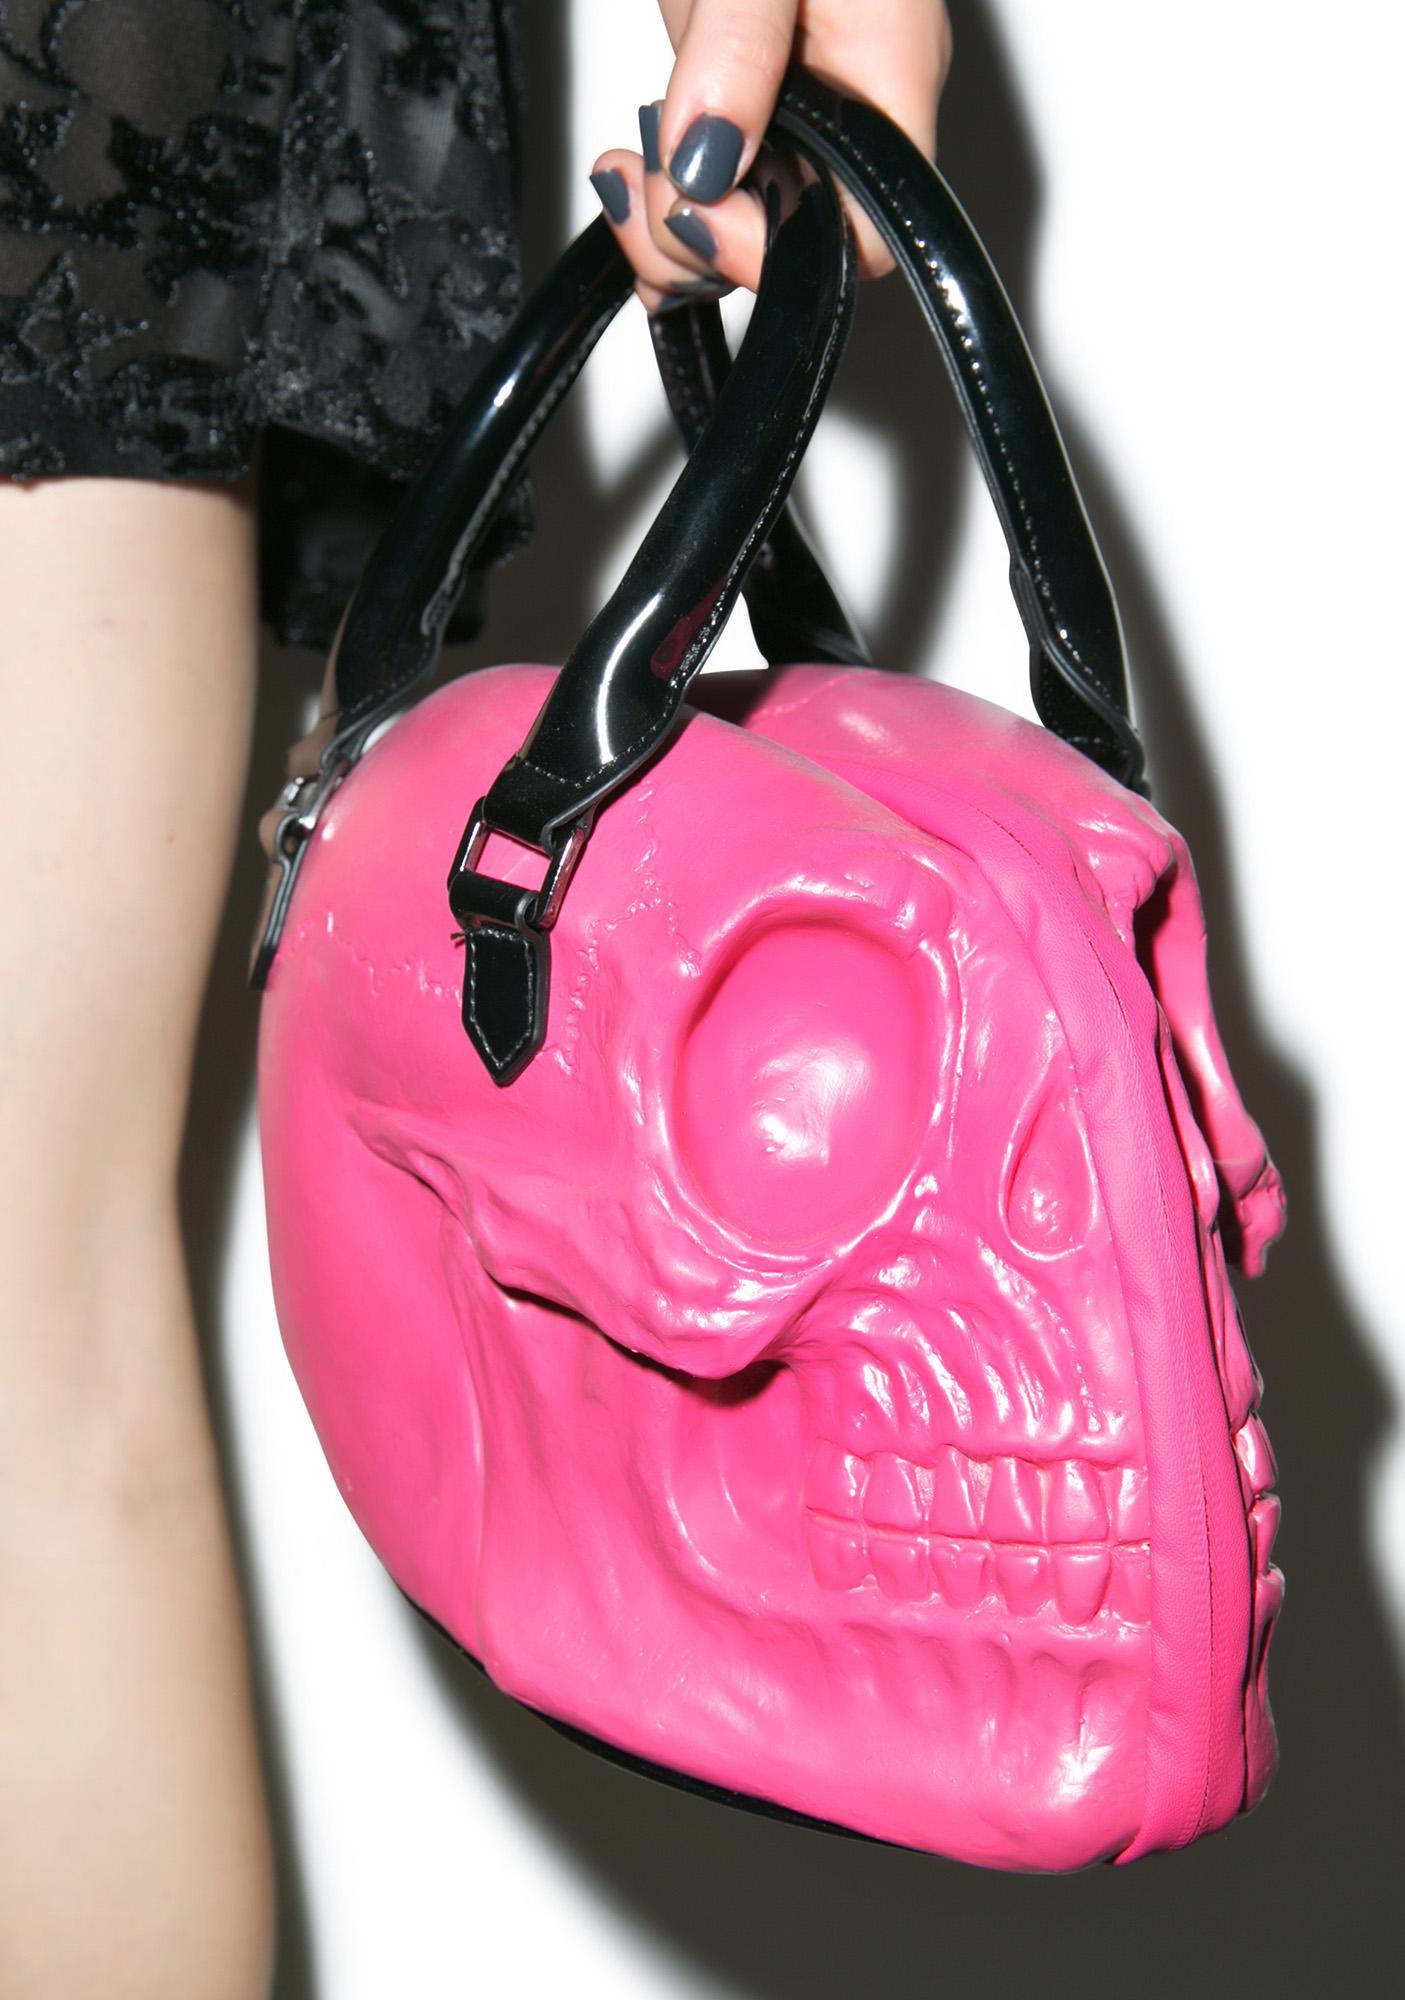 Kreepsville 666 Skull Collection Hand Bag